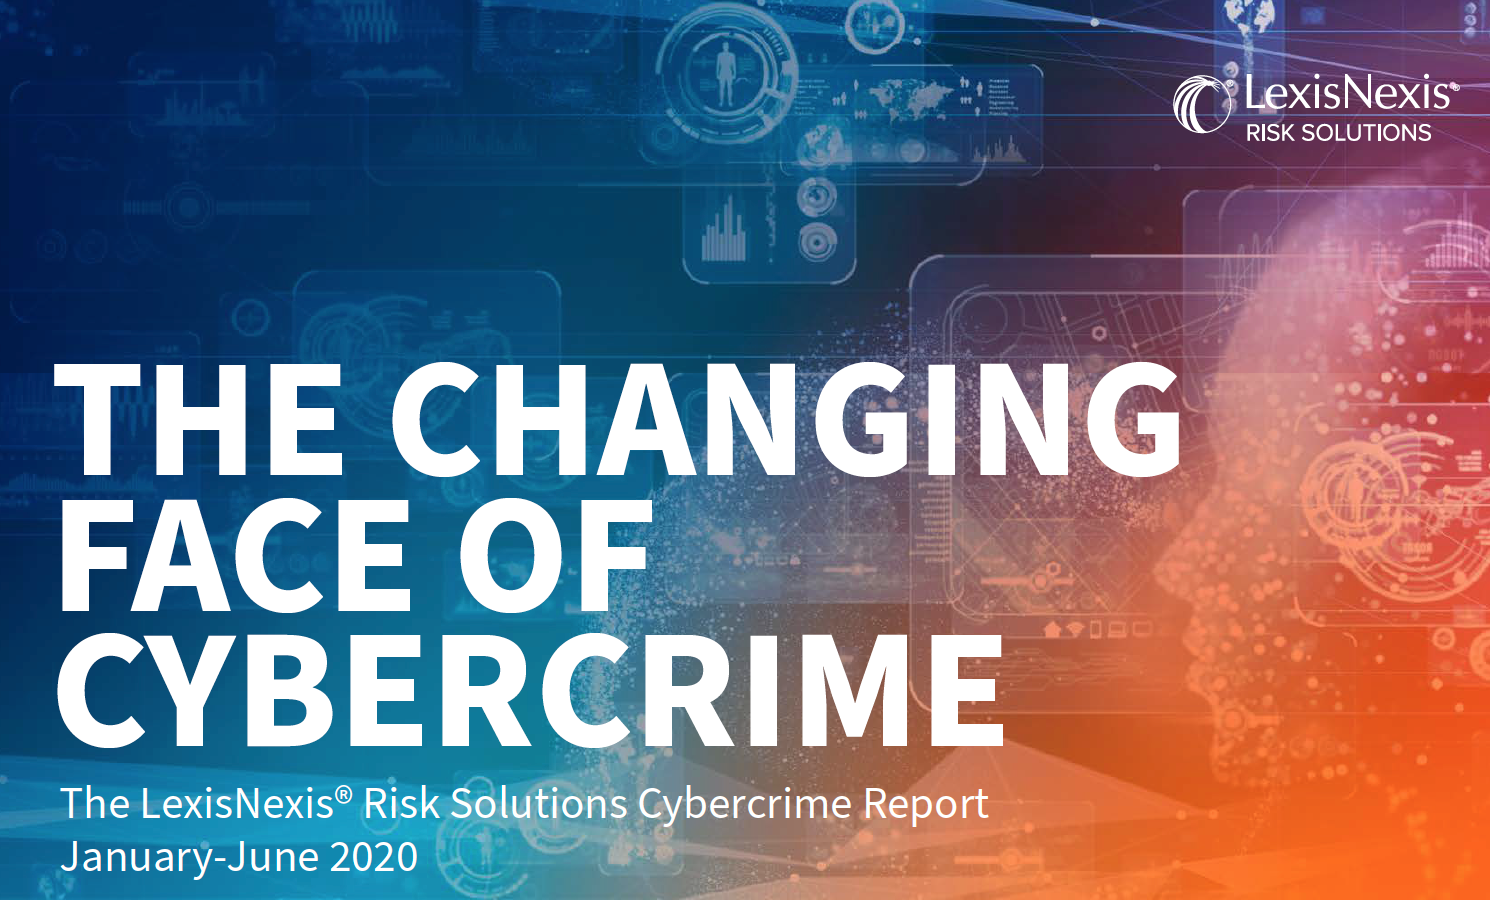 LexisNexis Risk Solutions Report